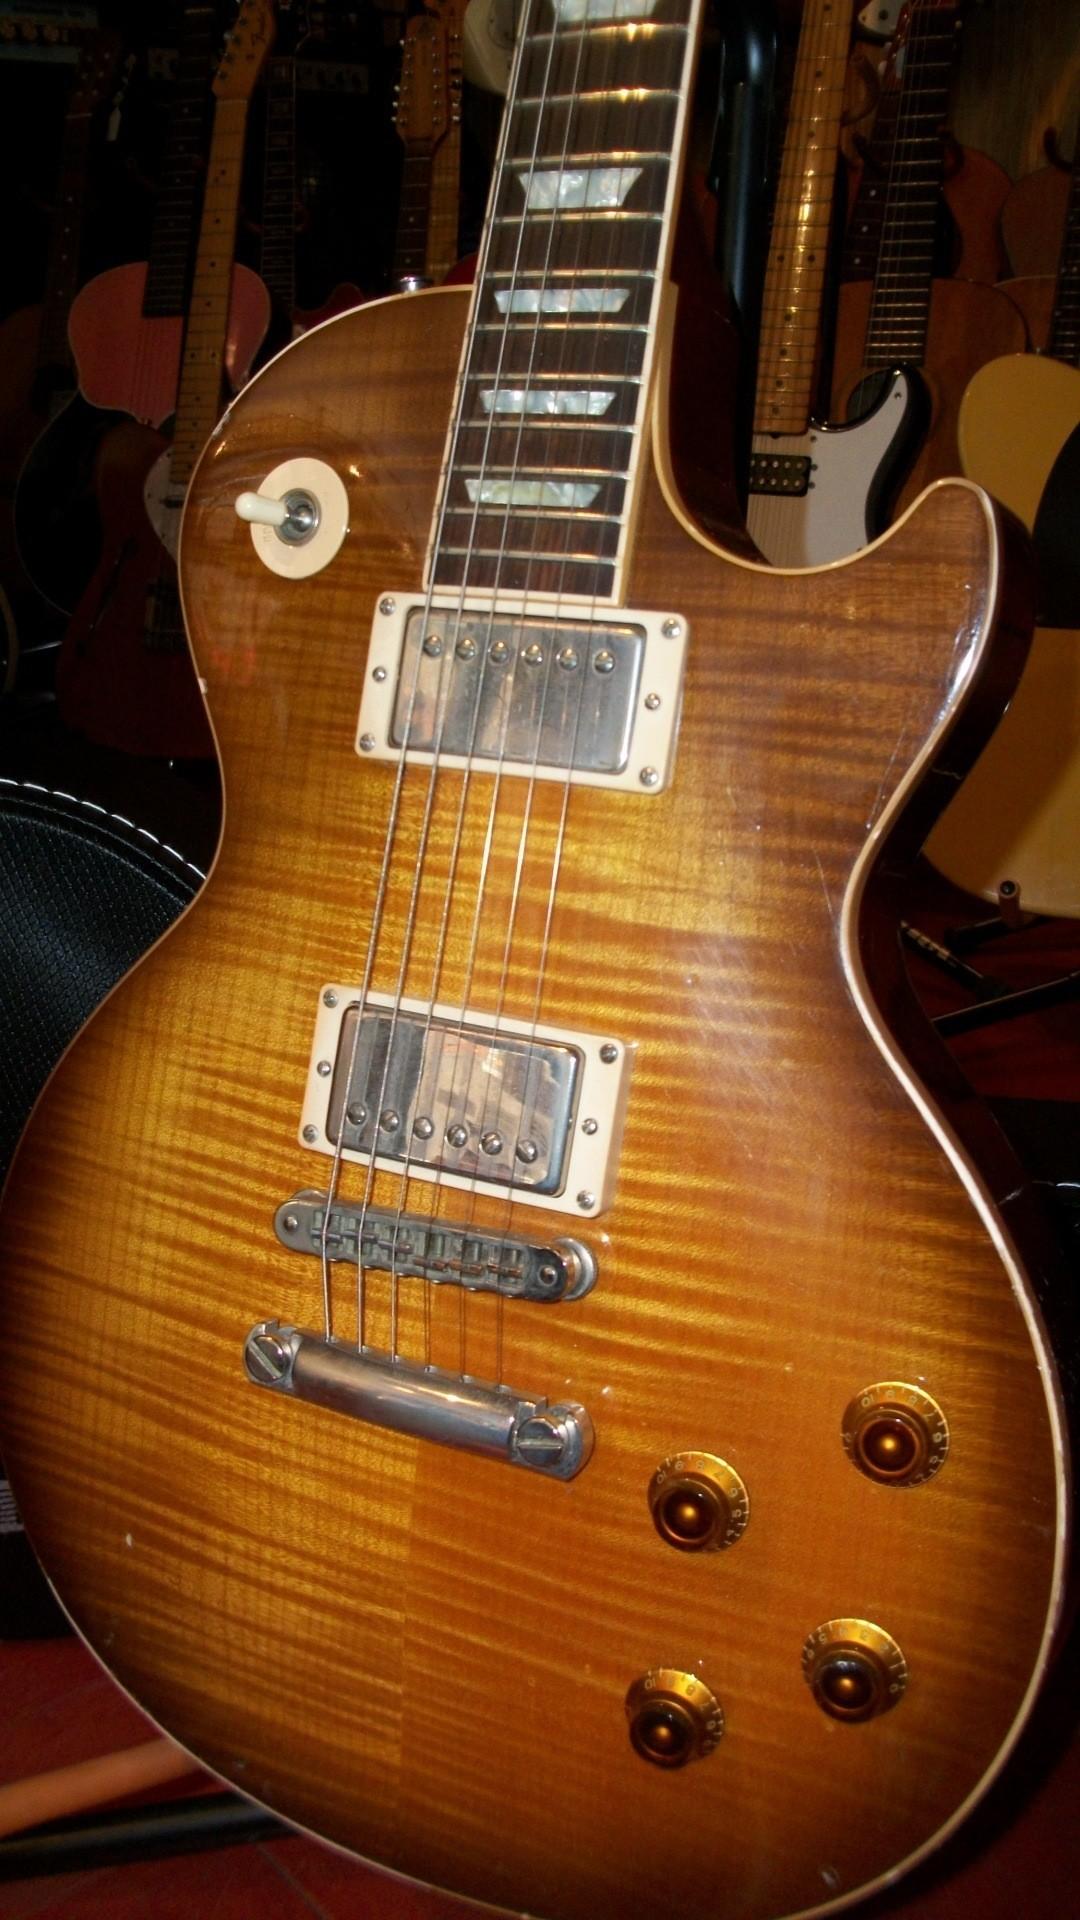 Old Electric Guitar iPhone 6 Plus HD Wallpaper …